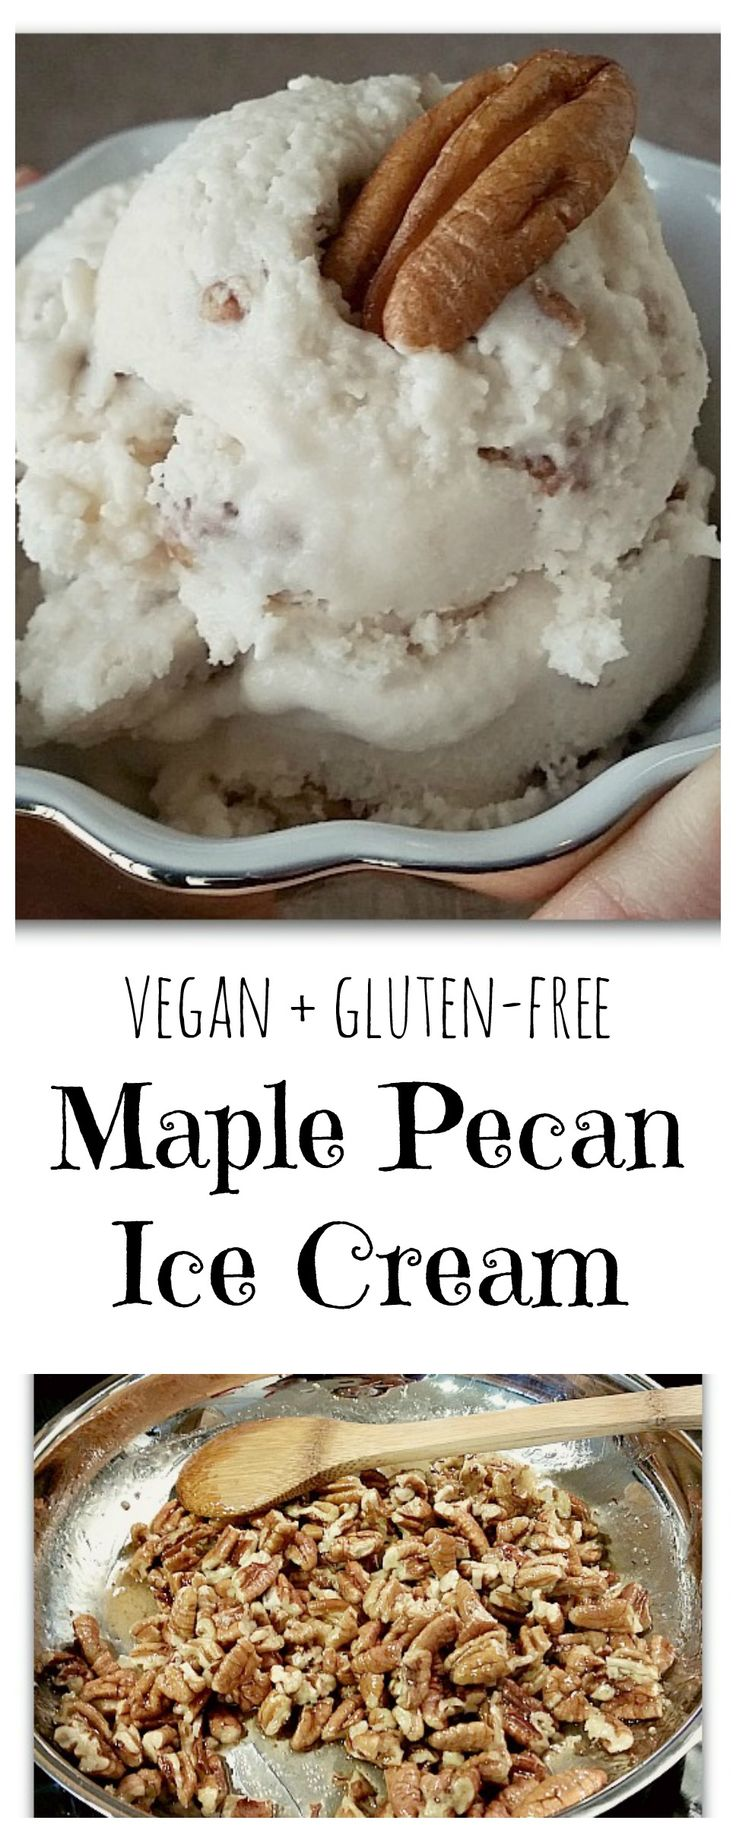 ... ice cream on Pinterest | Vegans, Raw ice cream and Ice cream bars